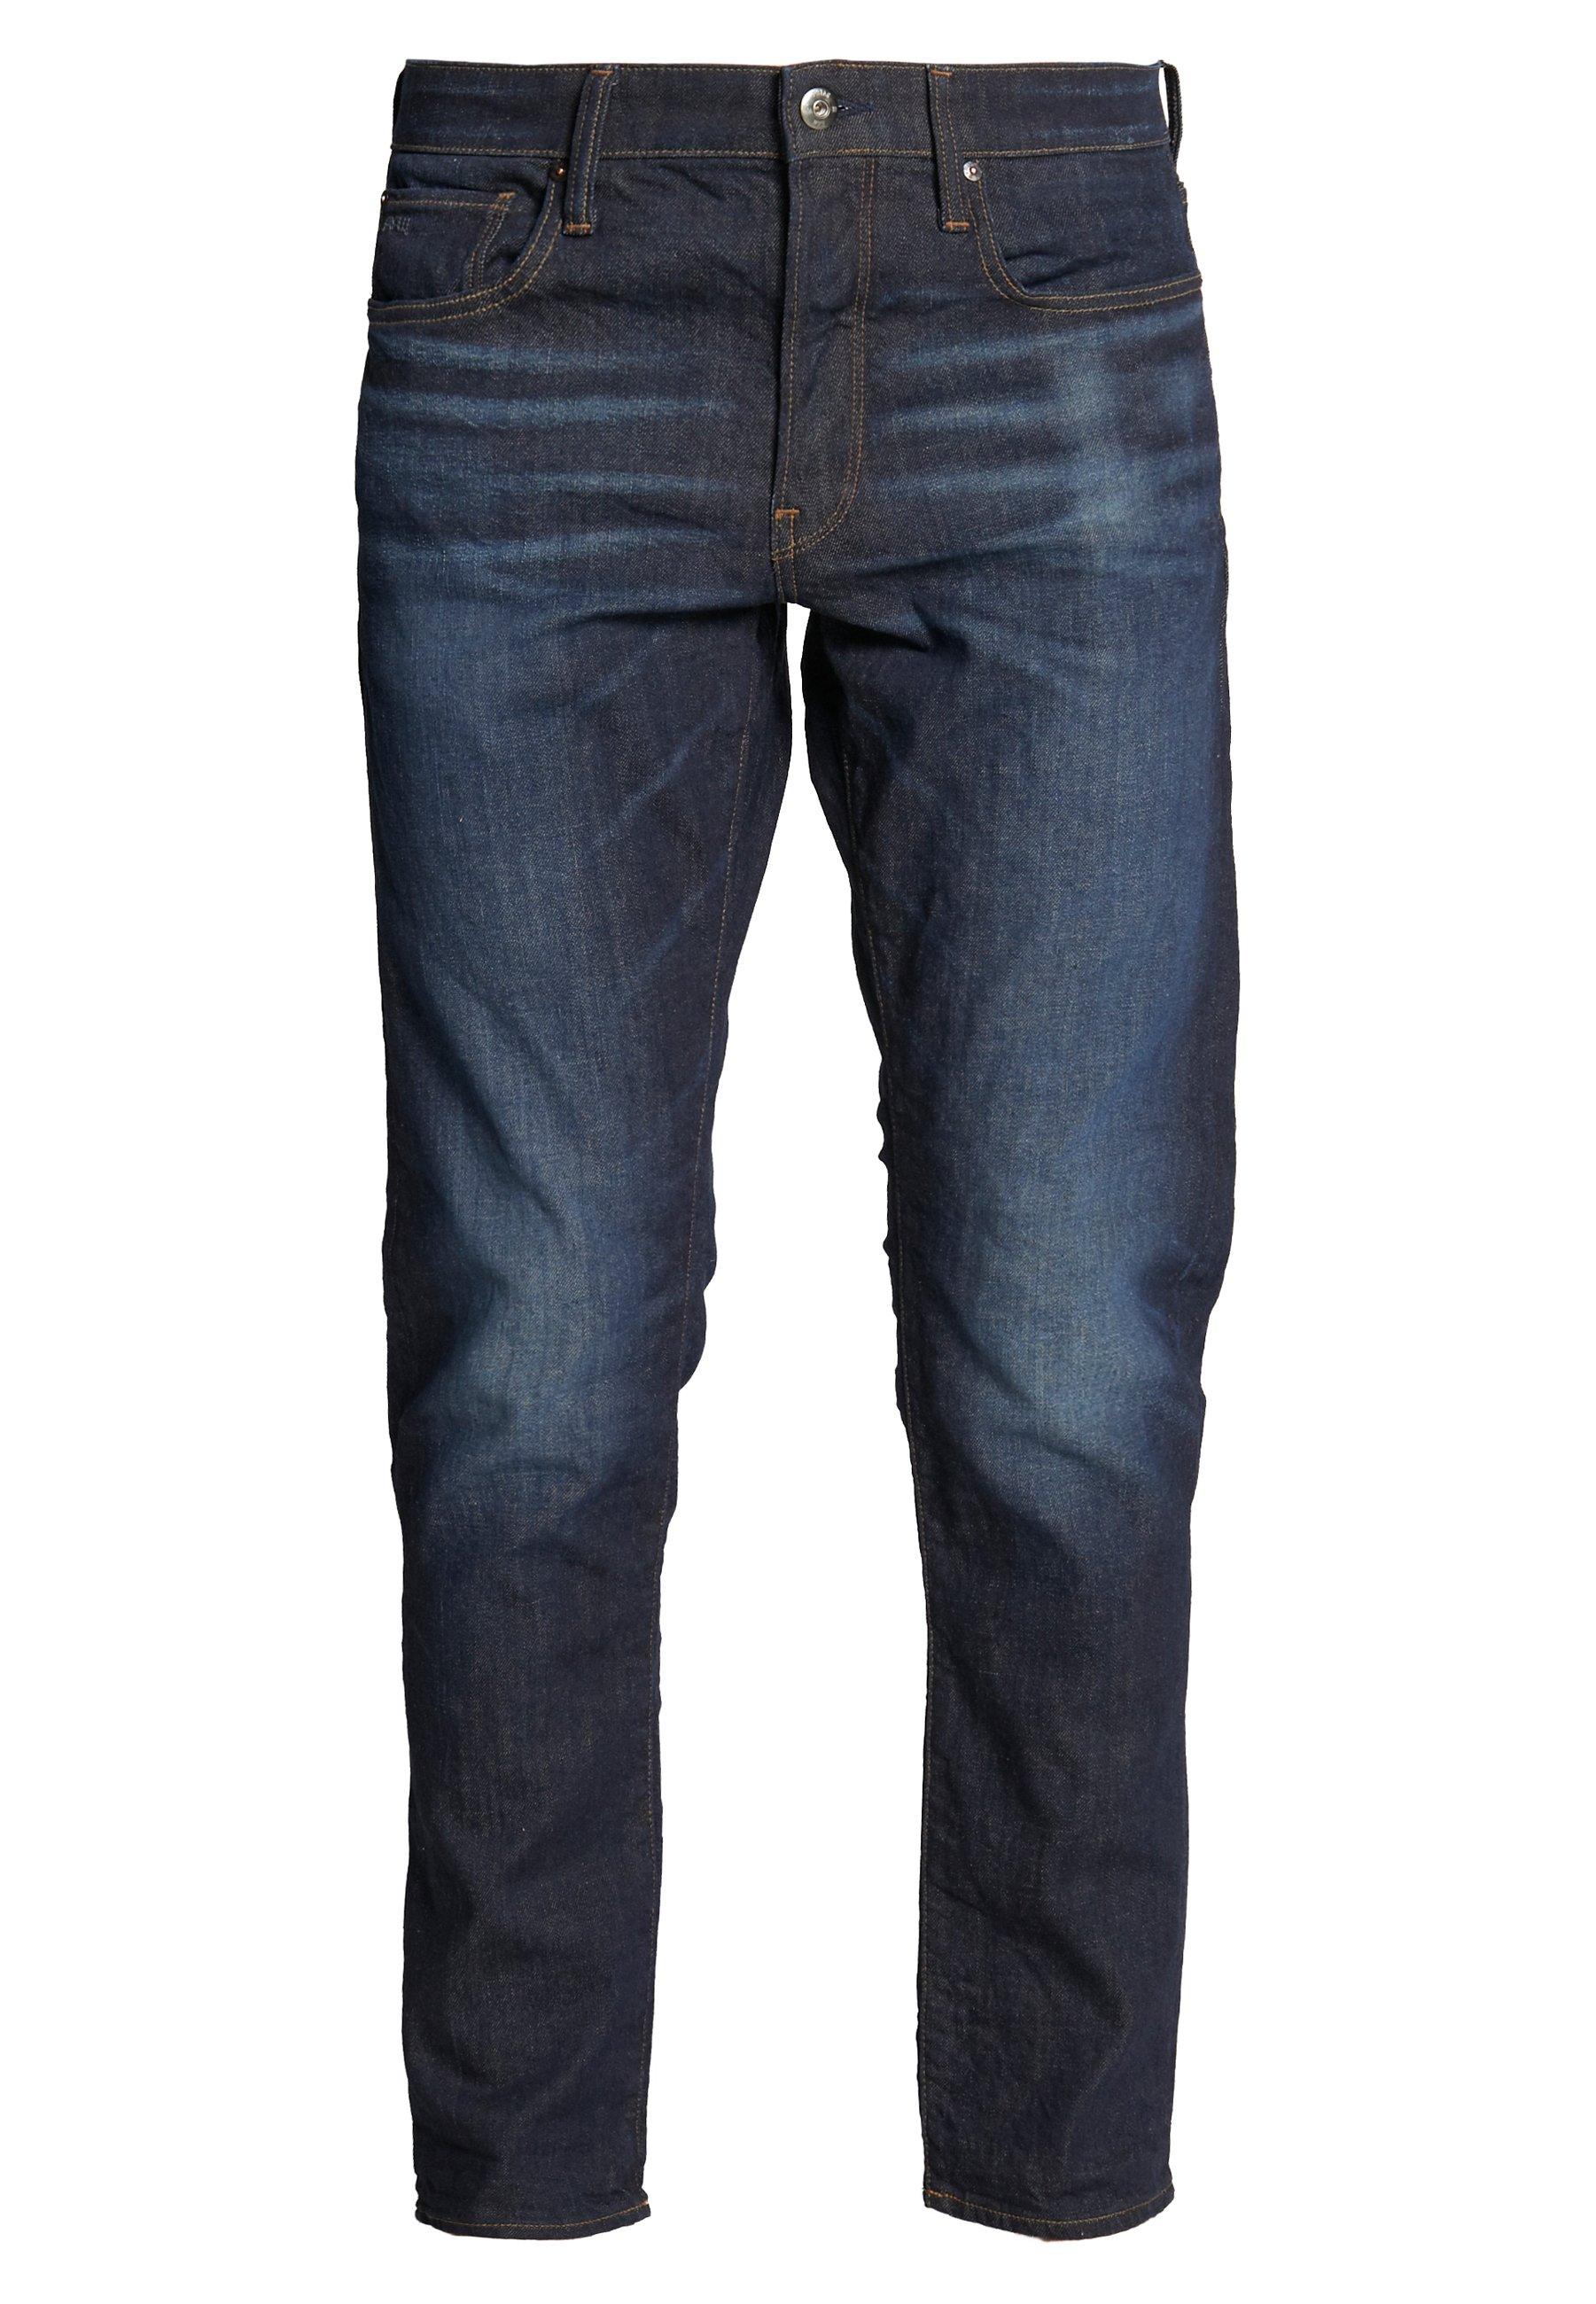 G-star Straight Tapered - Jeans Leg Kir Stretch Denim/worn In